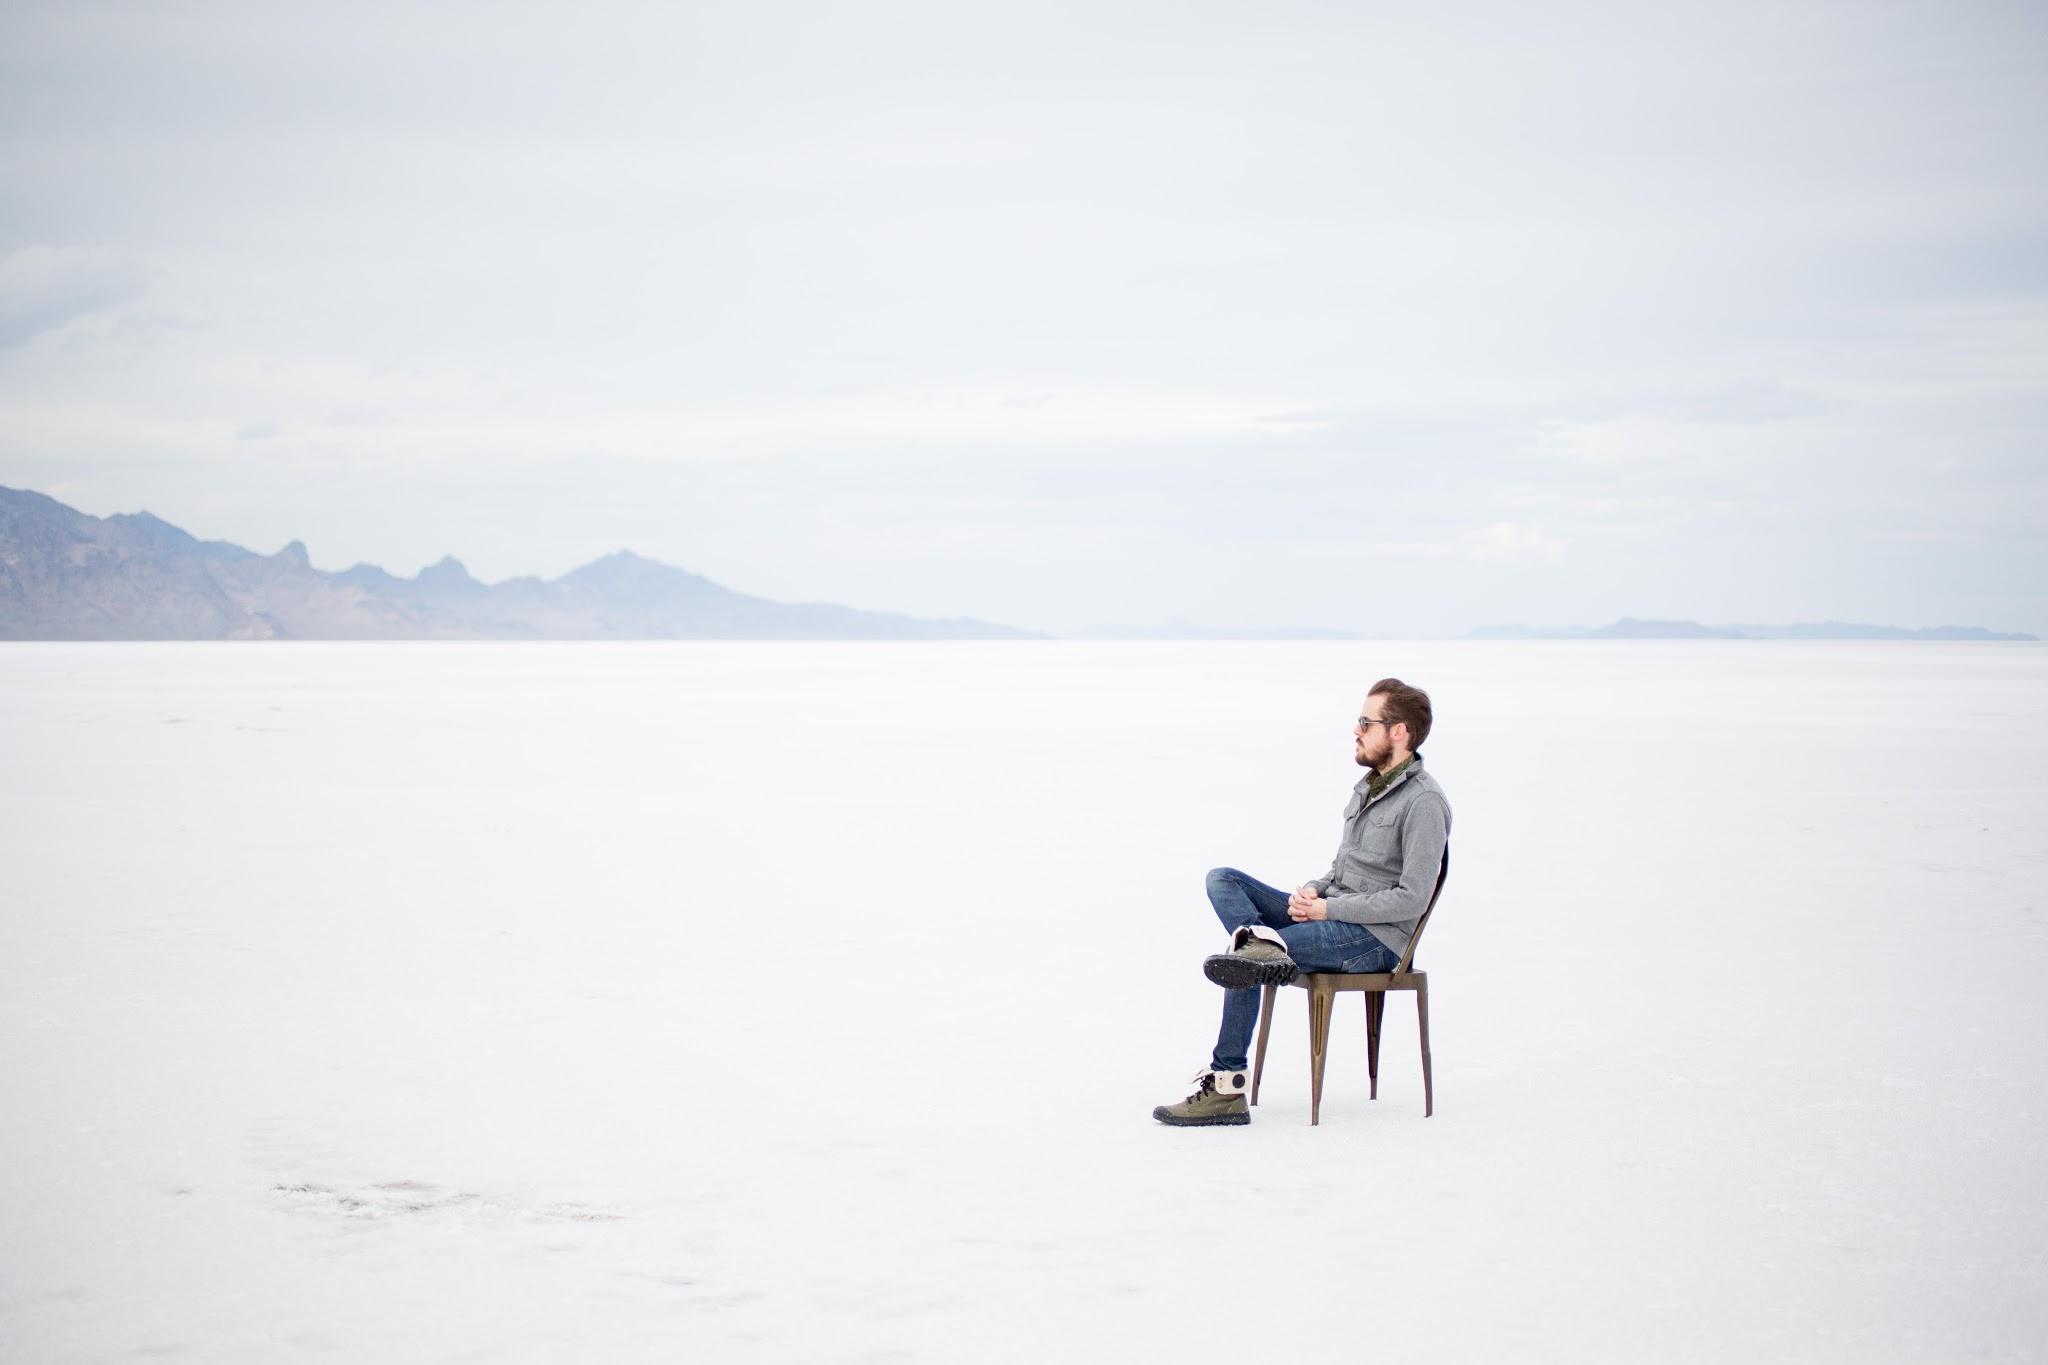 The Bonneville Salt Flats